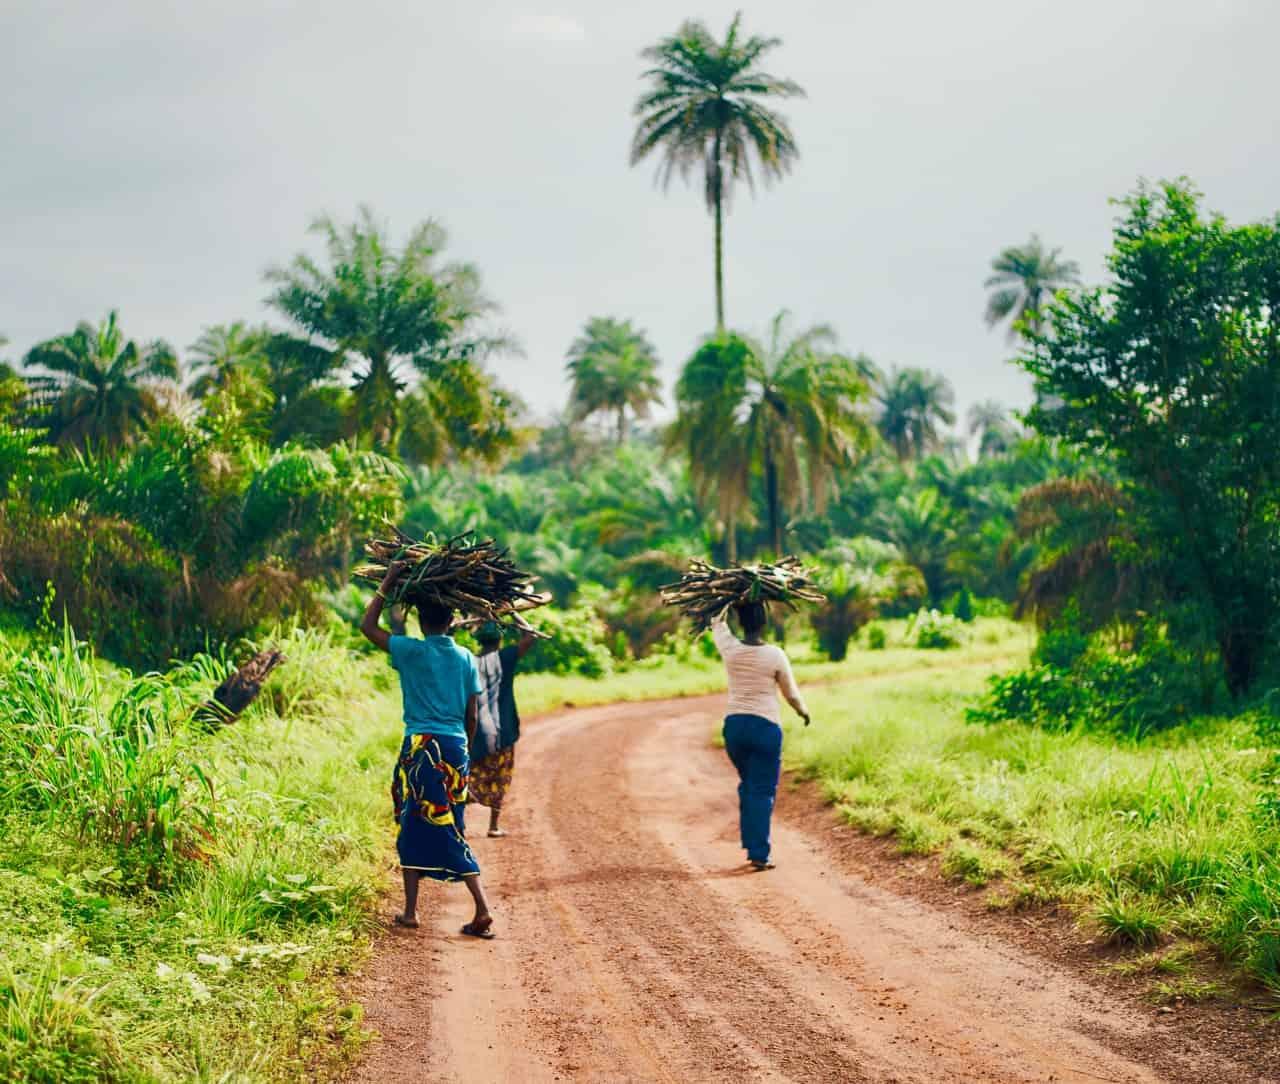 IBM's Microfinance Blockchain in Kenya Tests the Viability of Hyperledger